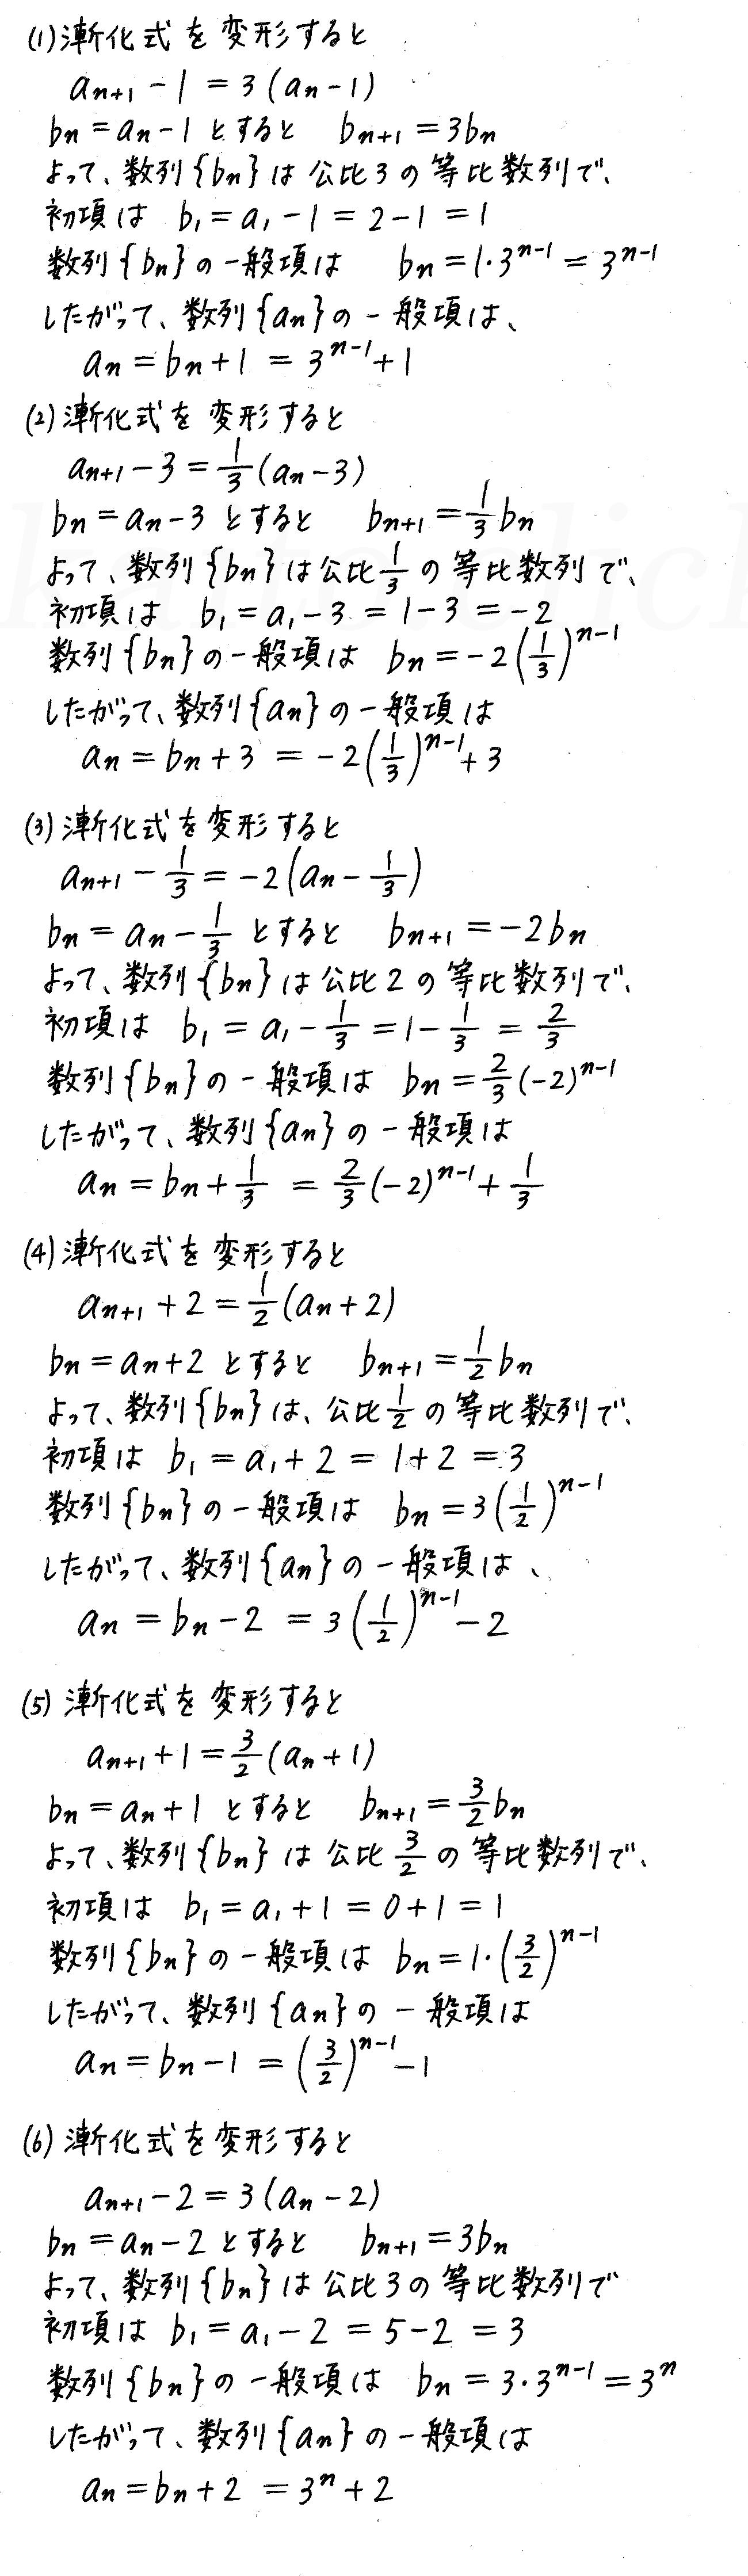 3TRIAL数学B-222解答